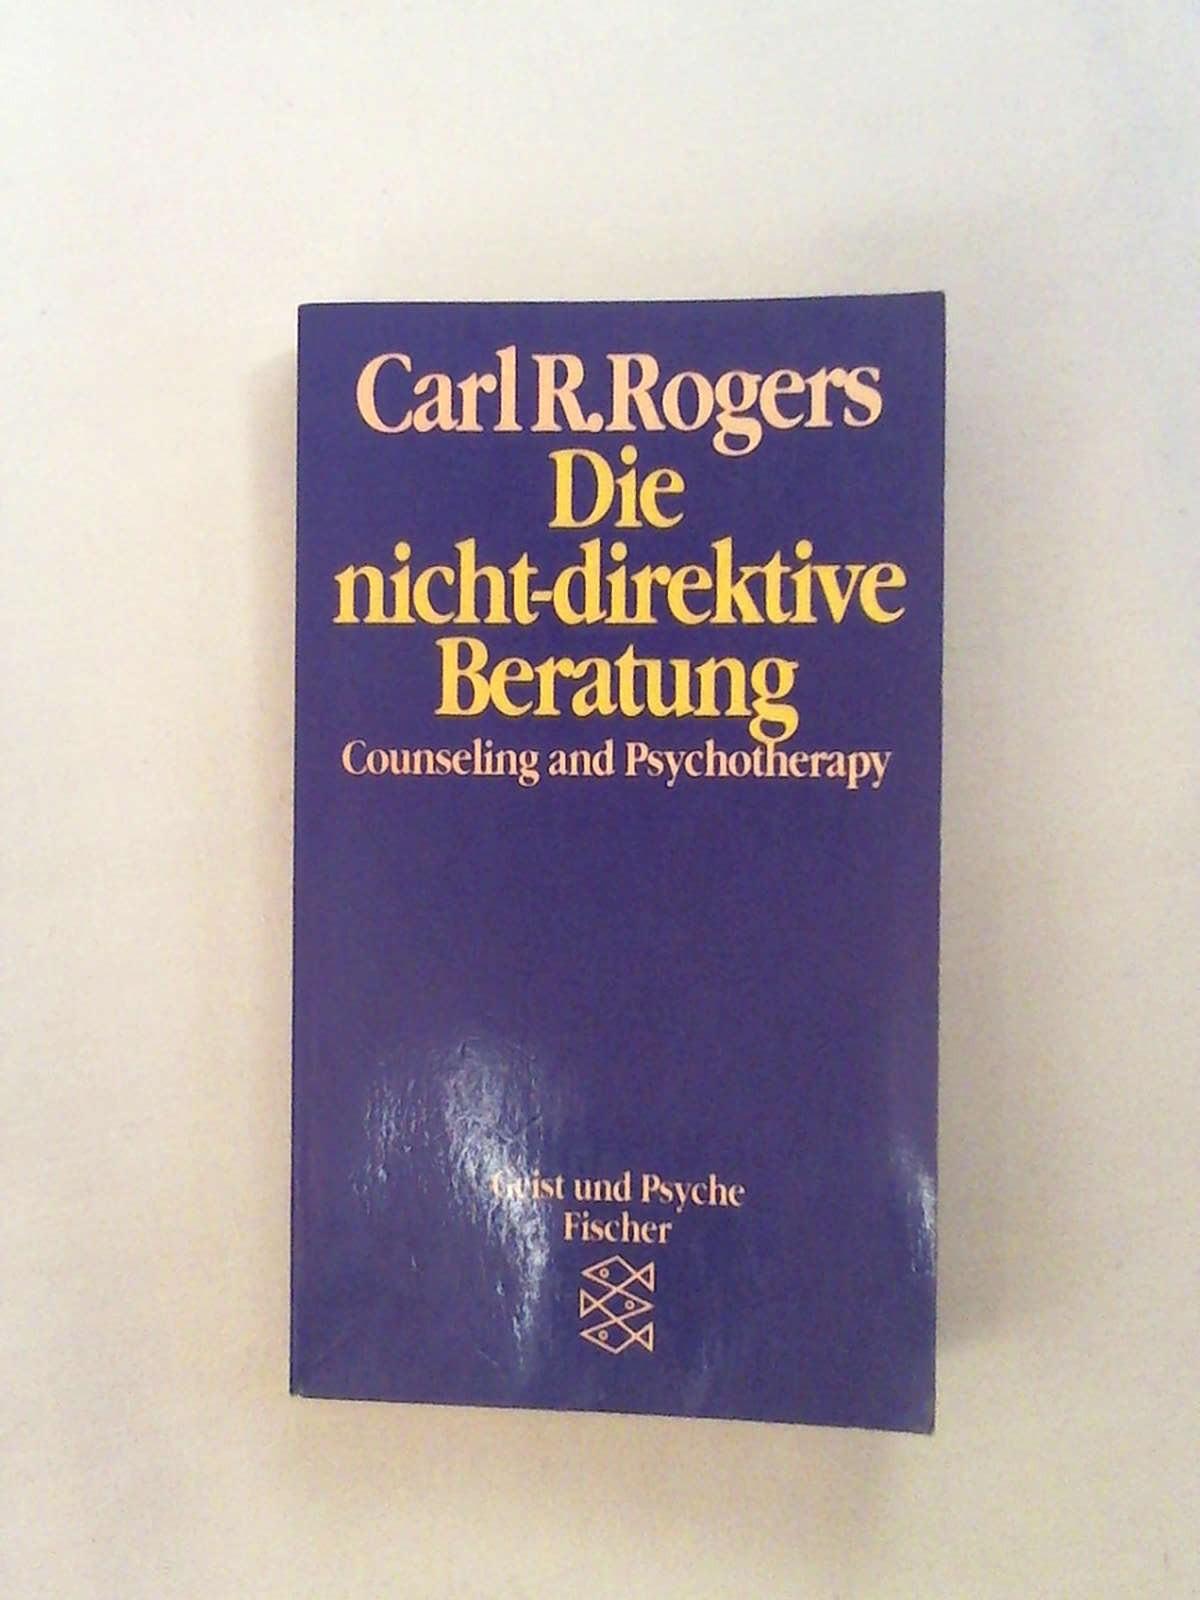 Die nicht-direktive Beratung - Carl R. Rogers